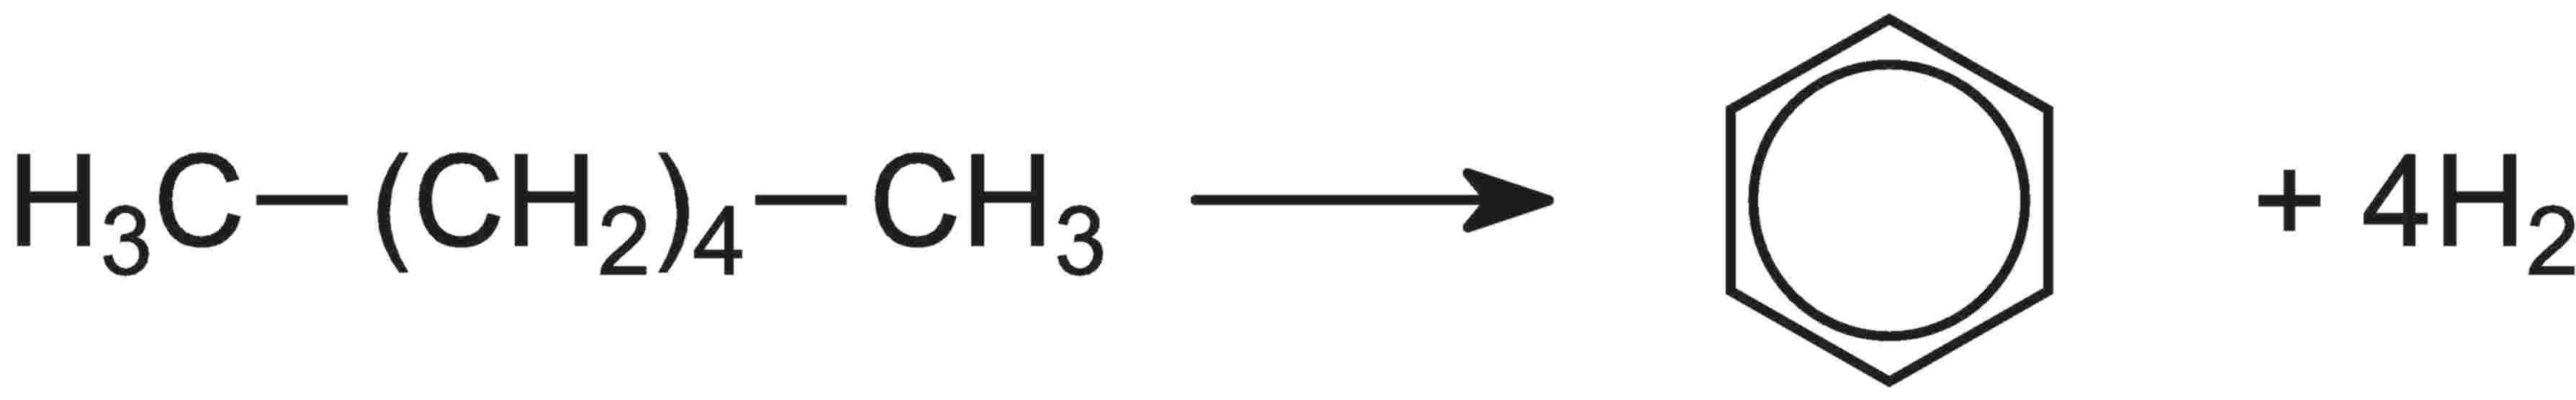 Benzene and methylbenzenes